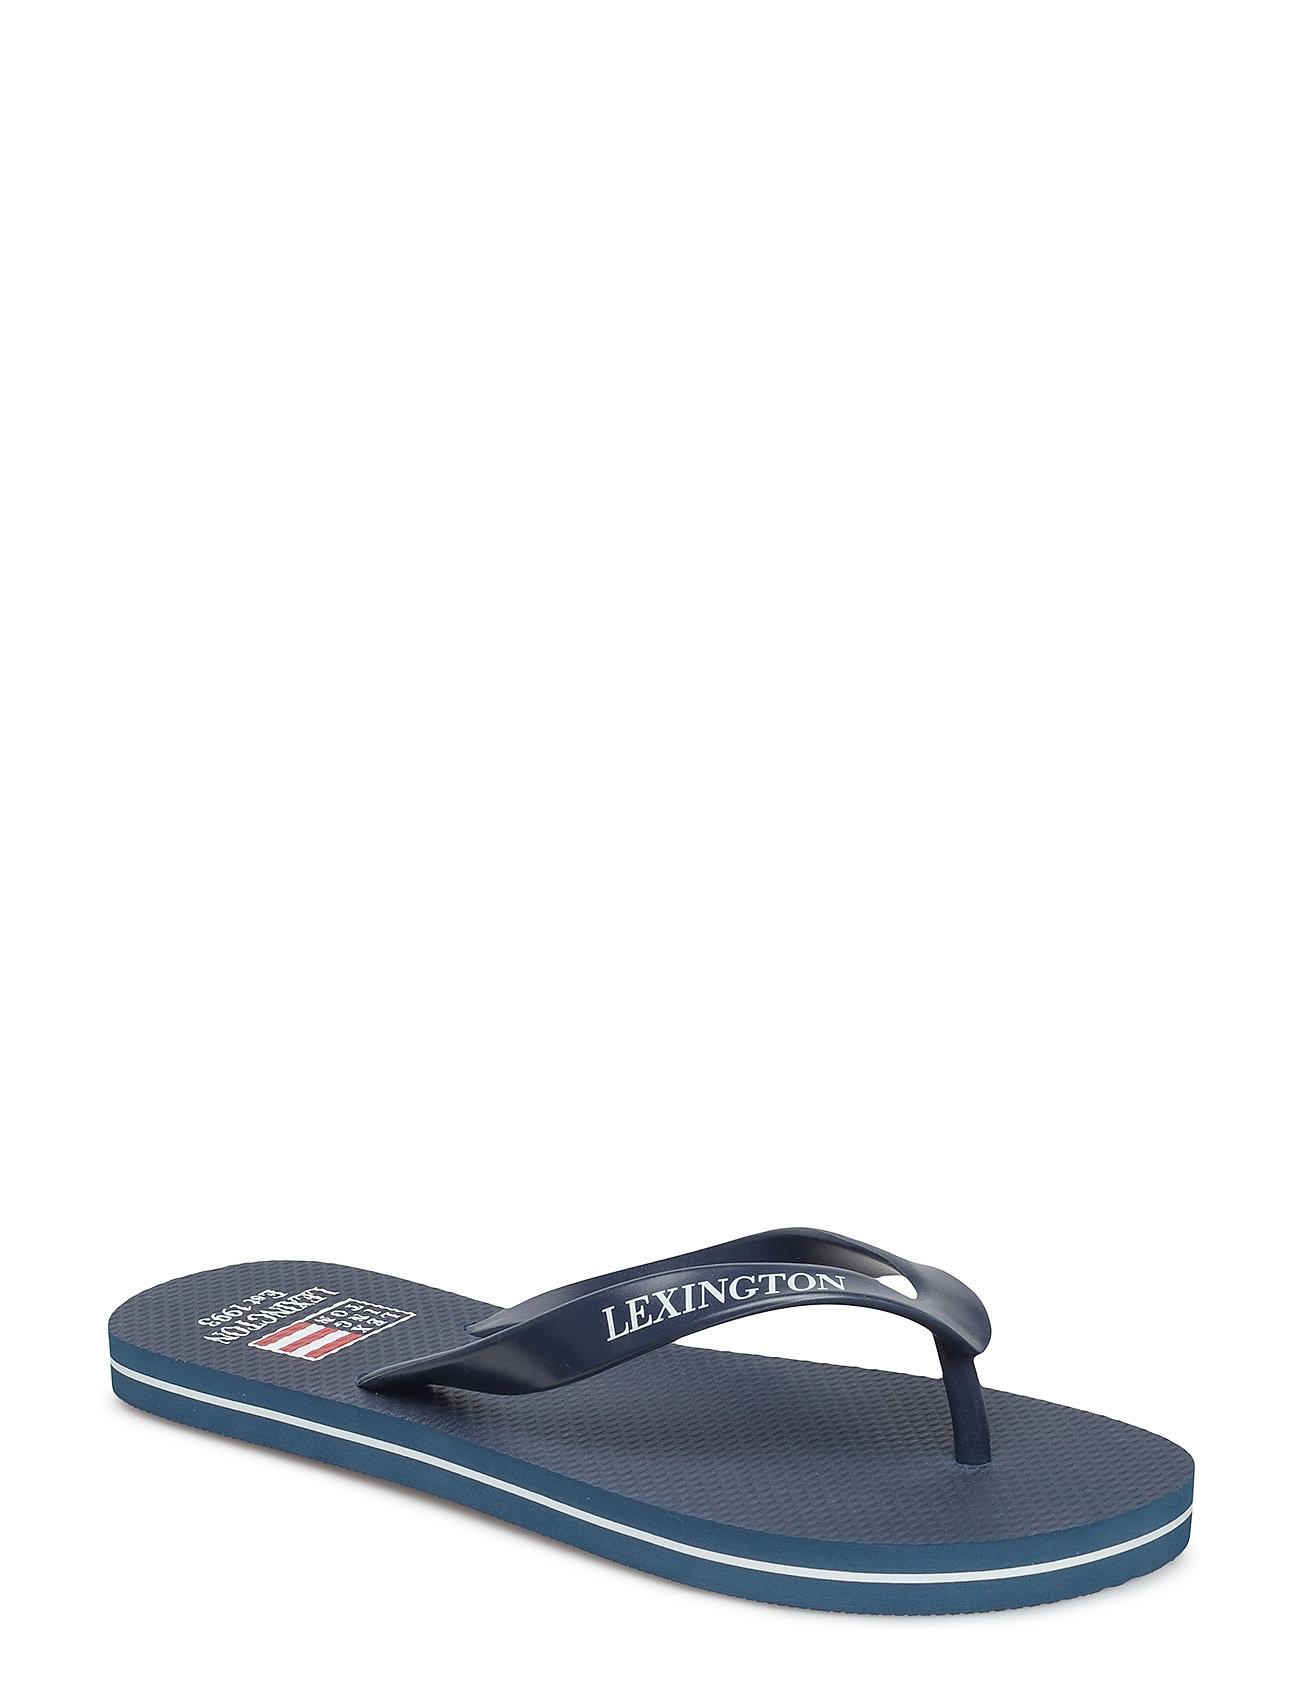 cbb4e1cf1a94 Orlando Flip Flops Klipklapper Sandaler Blå LEXINGTON CLOTHING